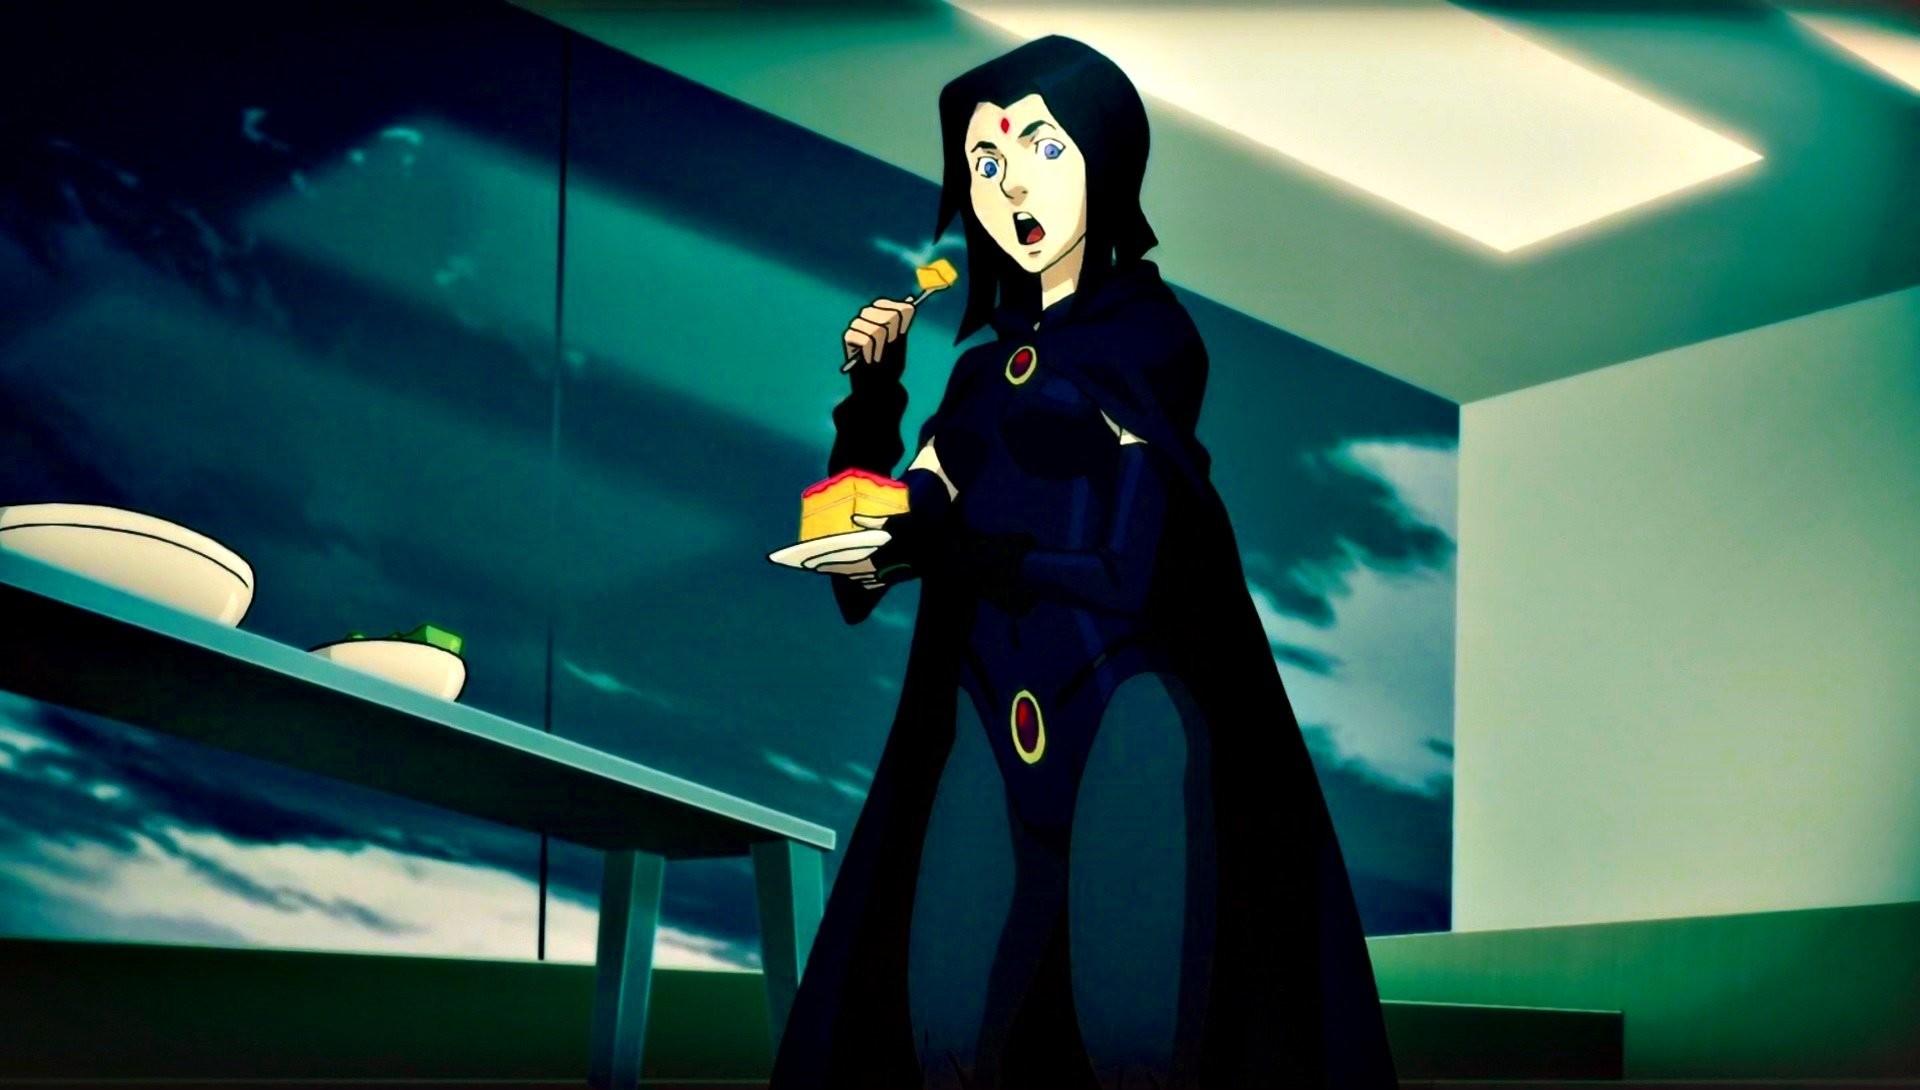 Raven Teen Titans Wallpaper 183 ①